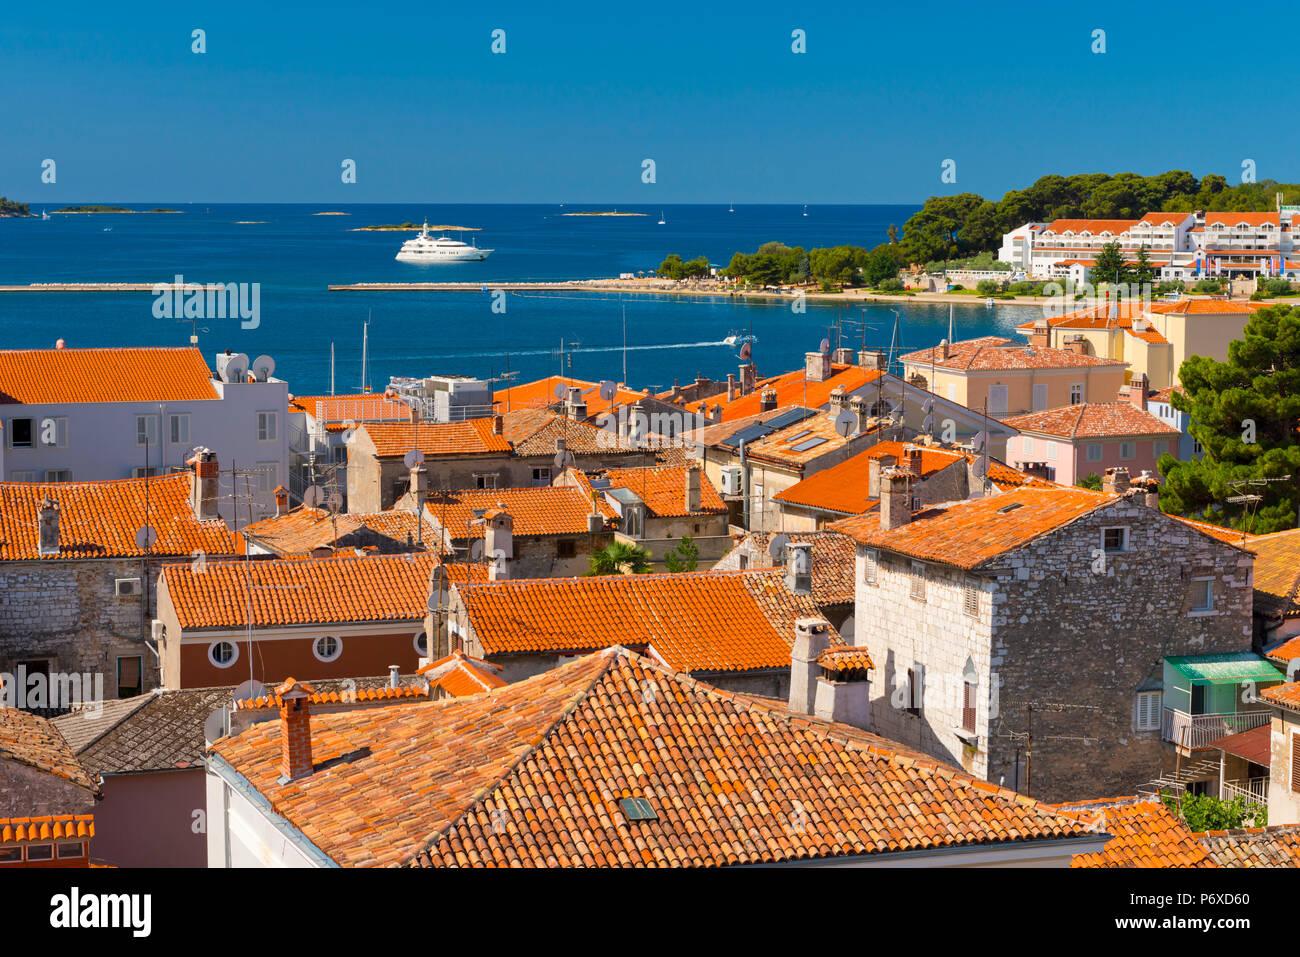 Croatia, Istria, Porec - Stock Image